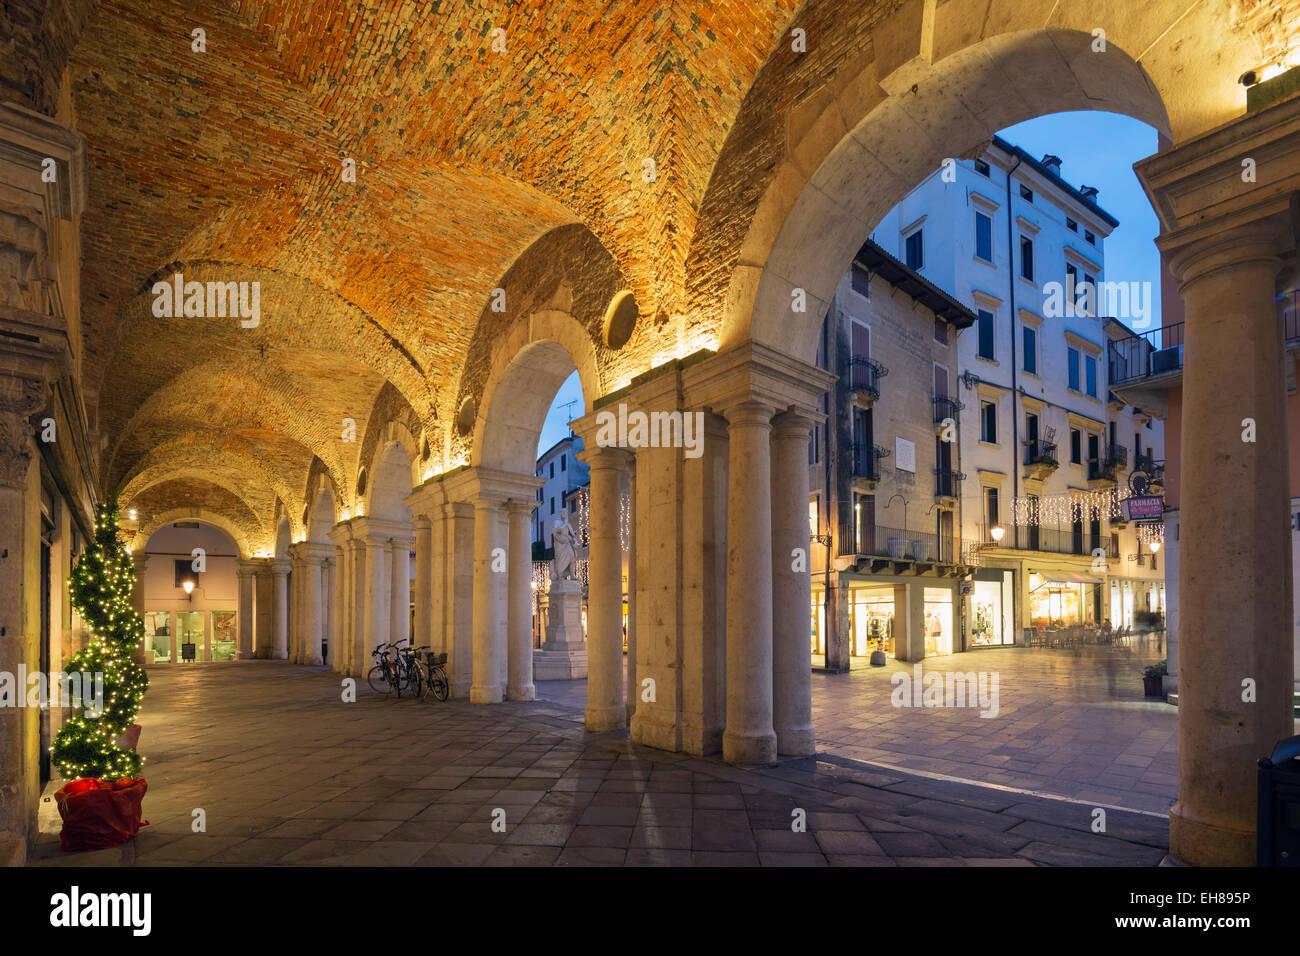 An arcade in Piazza Signori, Vicenza, UNESCO World Heritage Site, Veneto, Italy, Europe - Stock Image